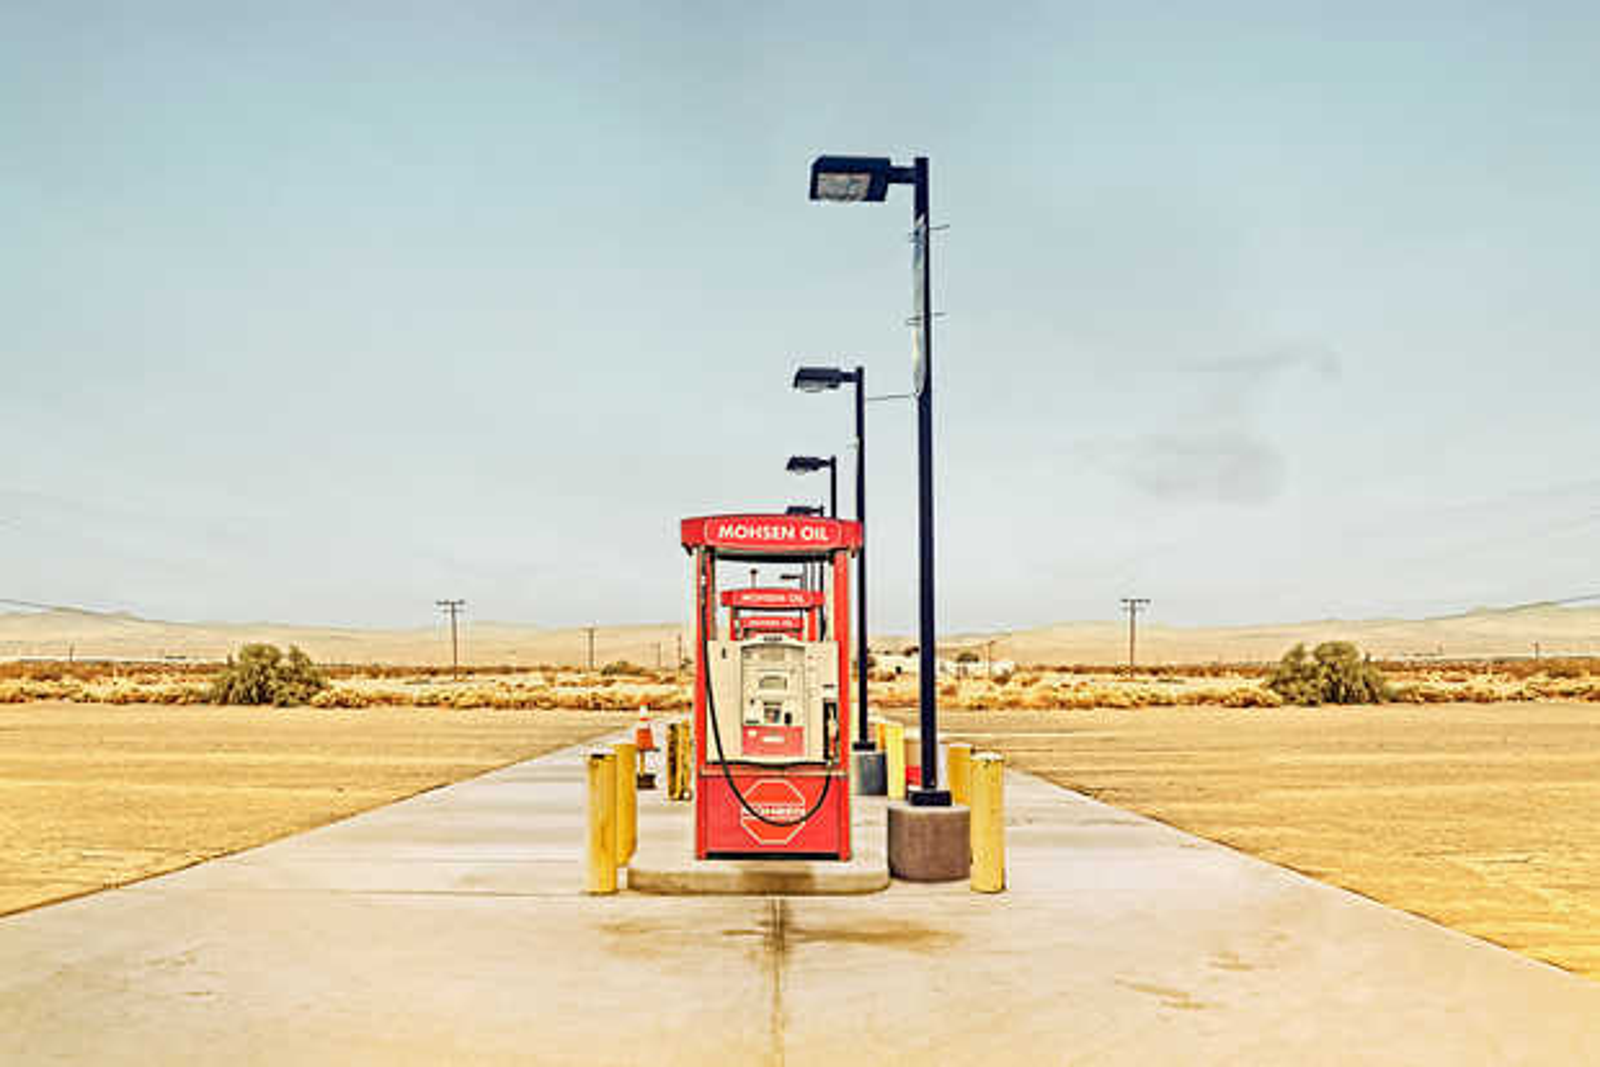 Petrol Pump - Sarah Johanna Eick